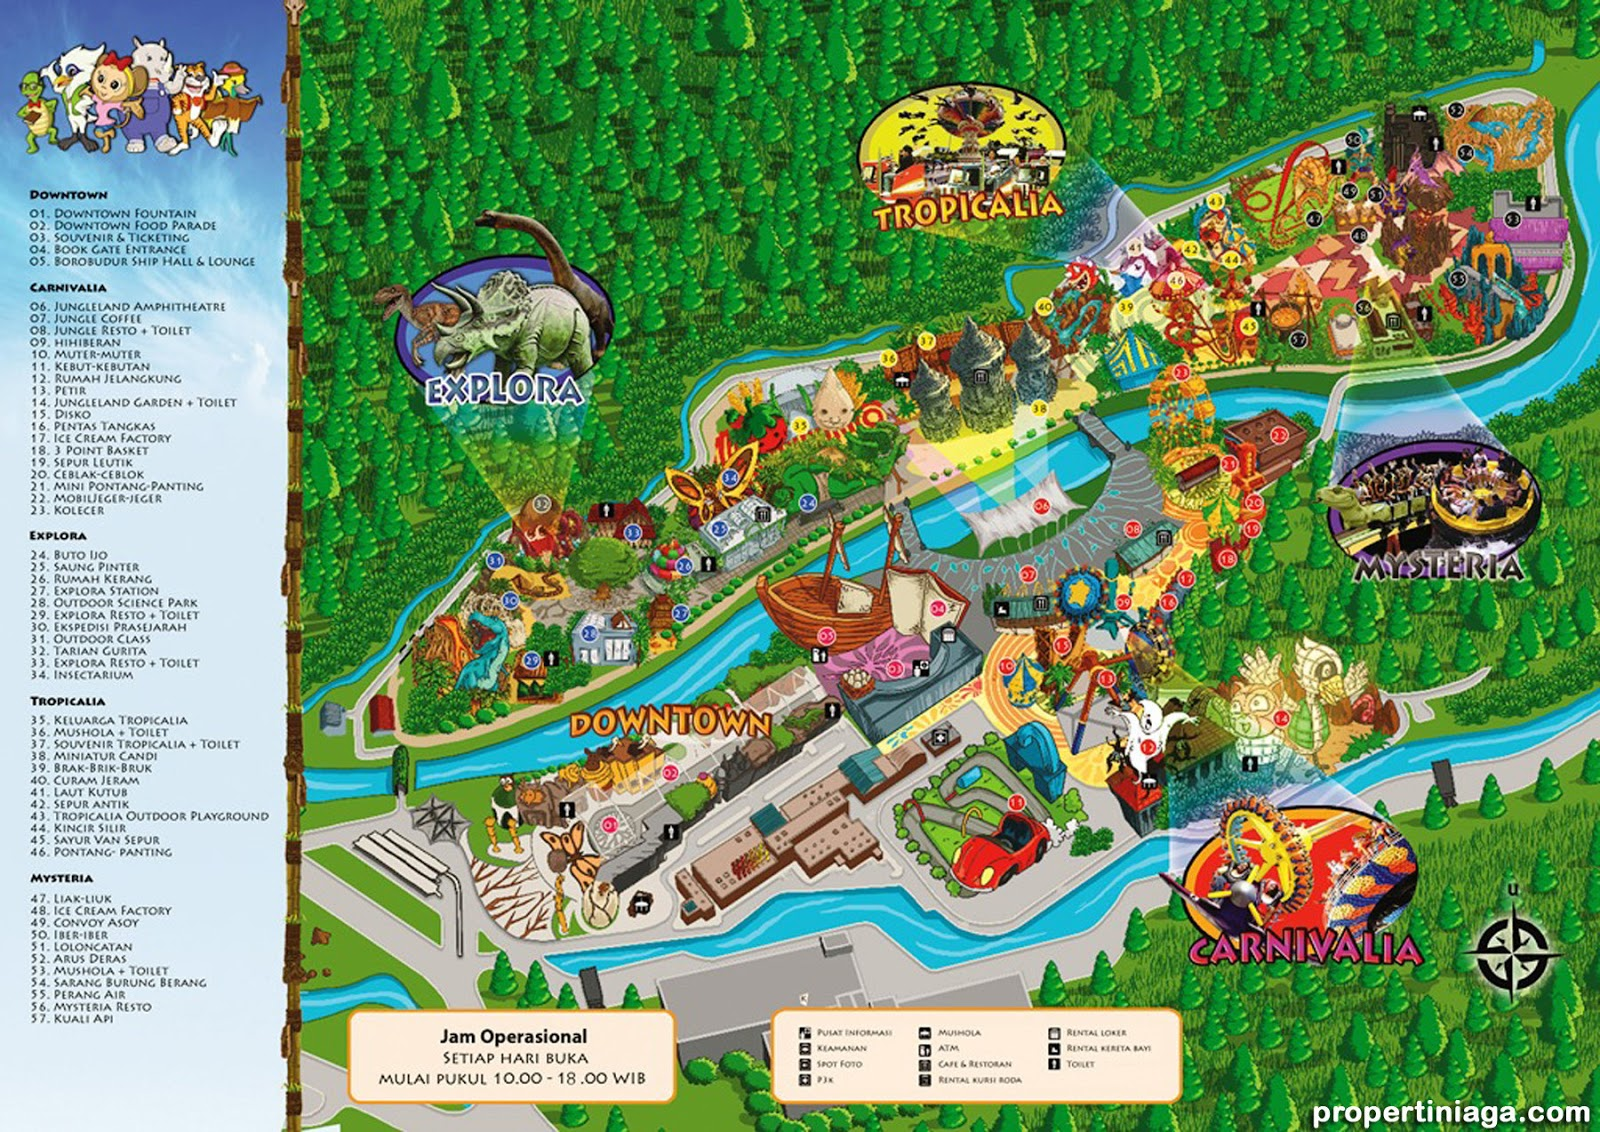 ... adventure theme park sentul bogor jungleland adventure theme park